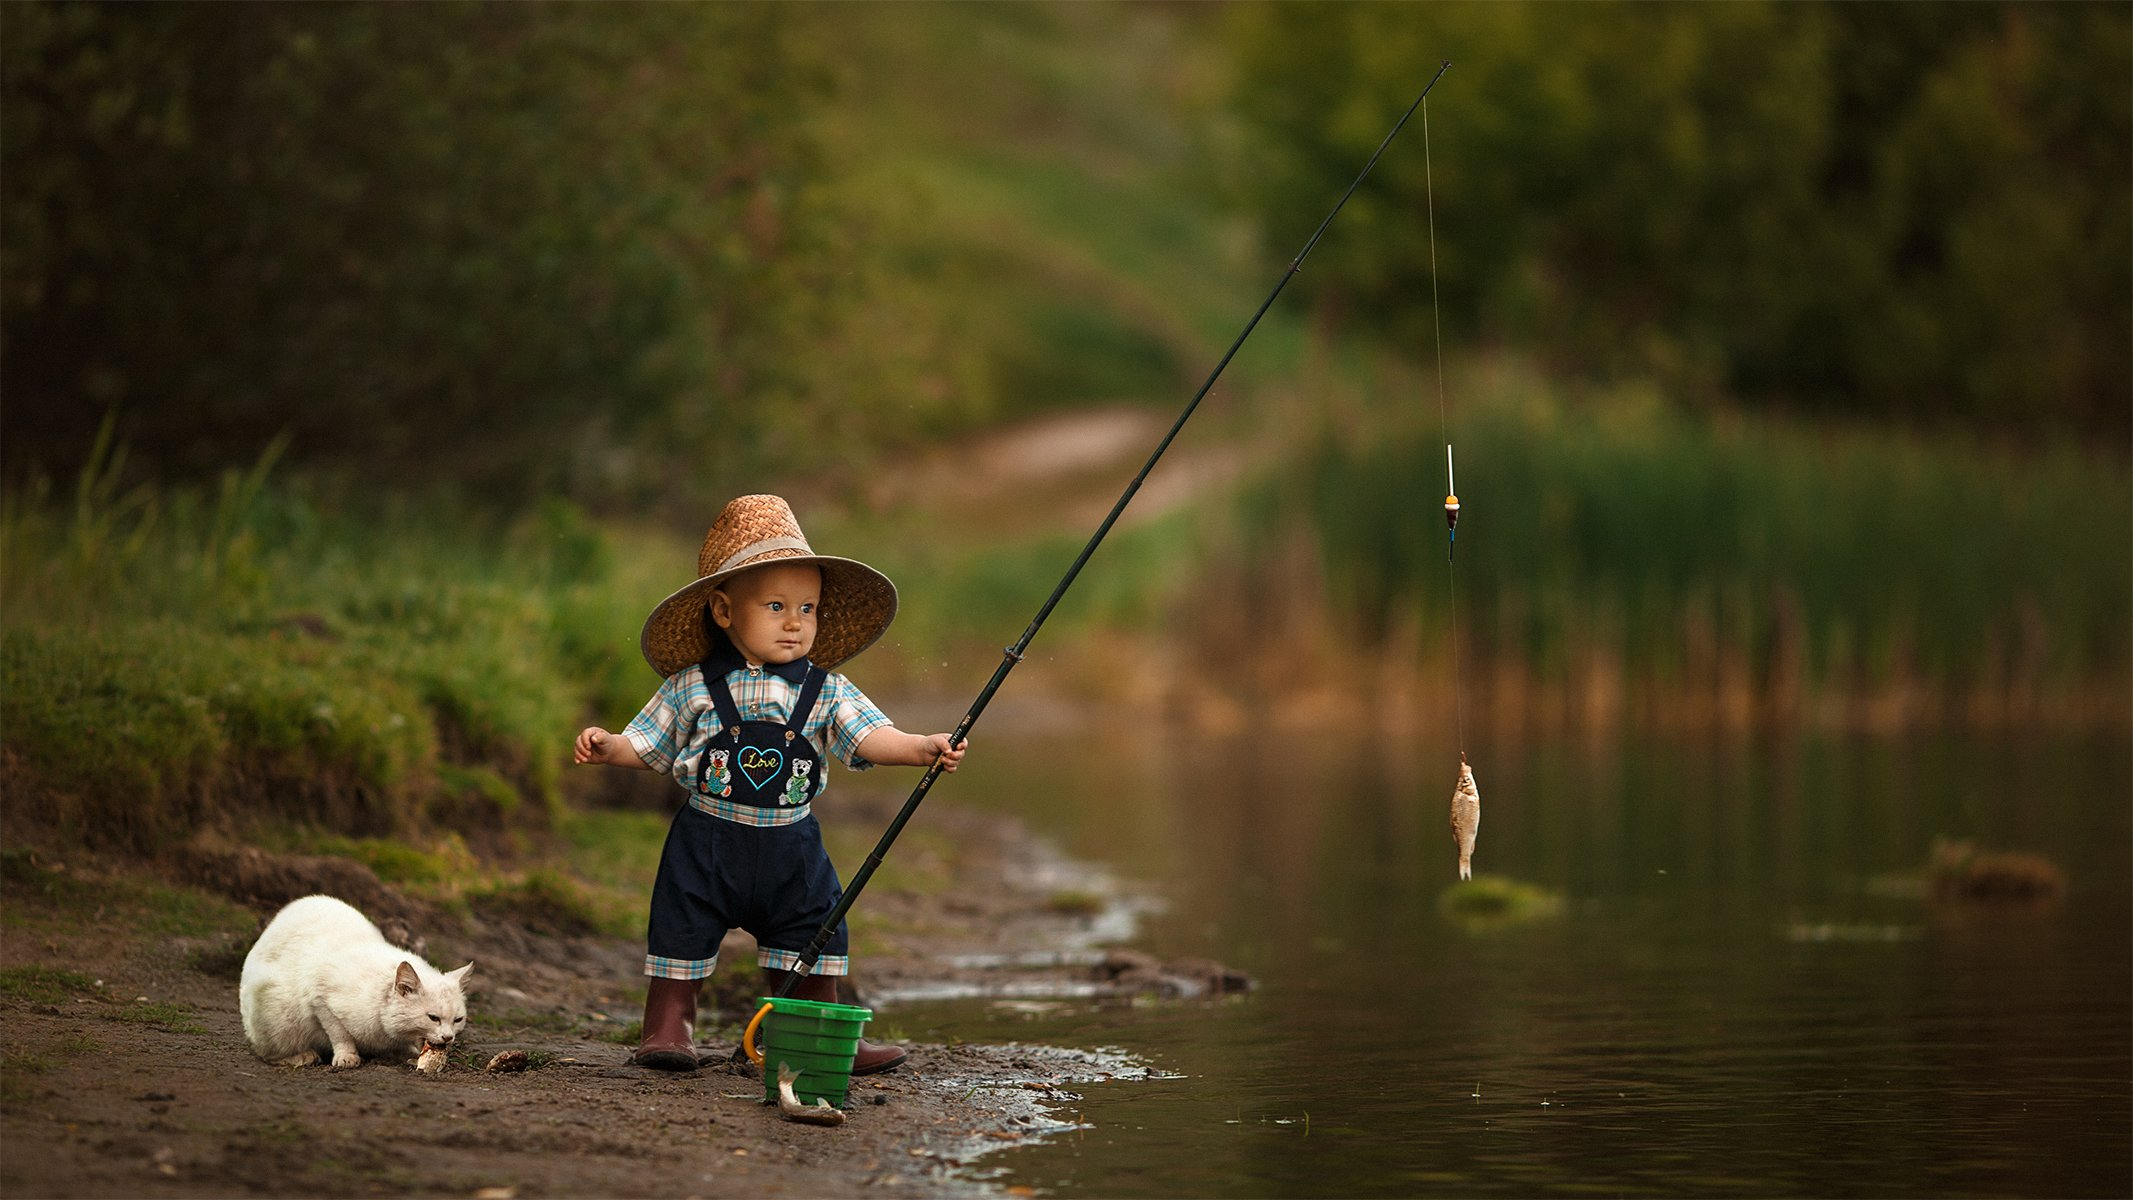 fisher child little boy summer cat ребенок мальчик рыбак лето кот, Александр Чуприна